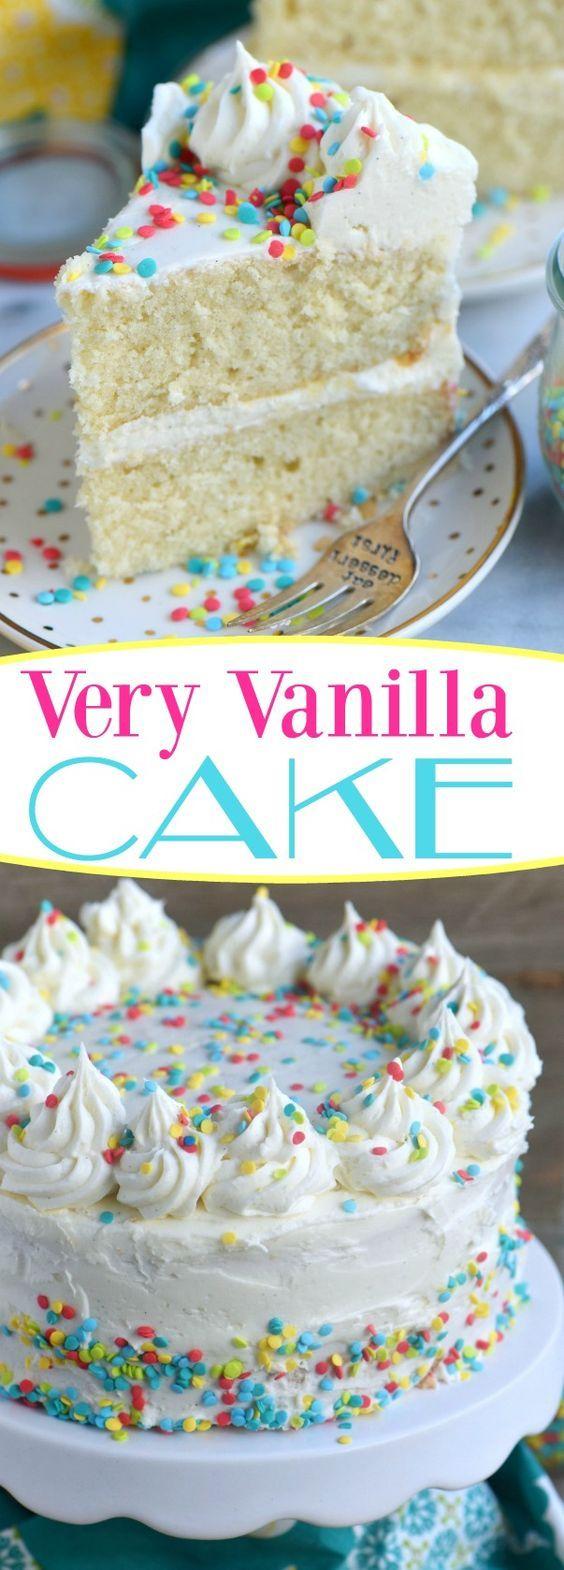 Very Vanilla Cake | Cake And Food Recipe